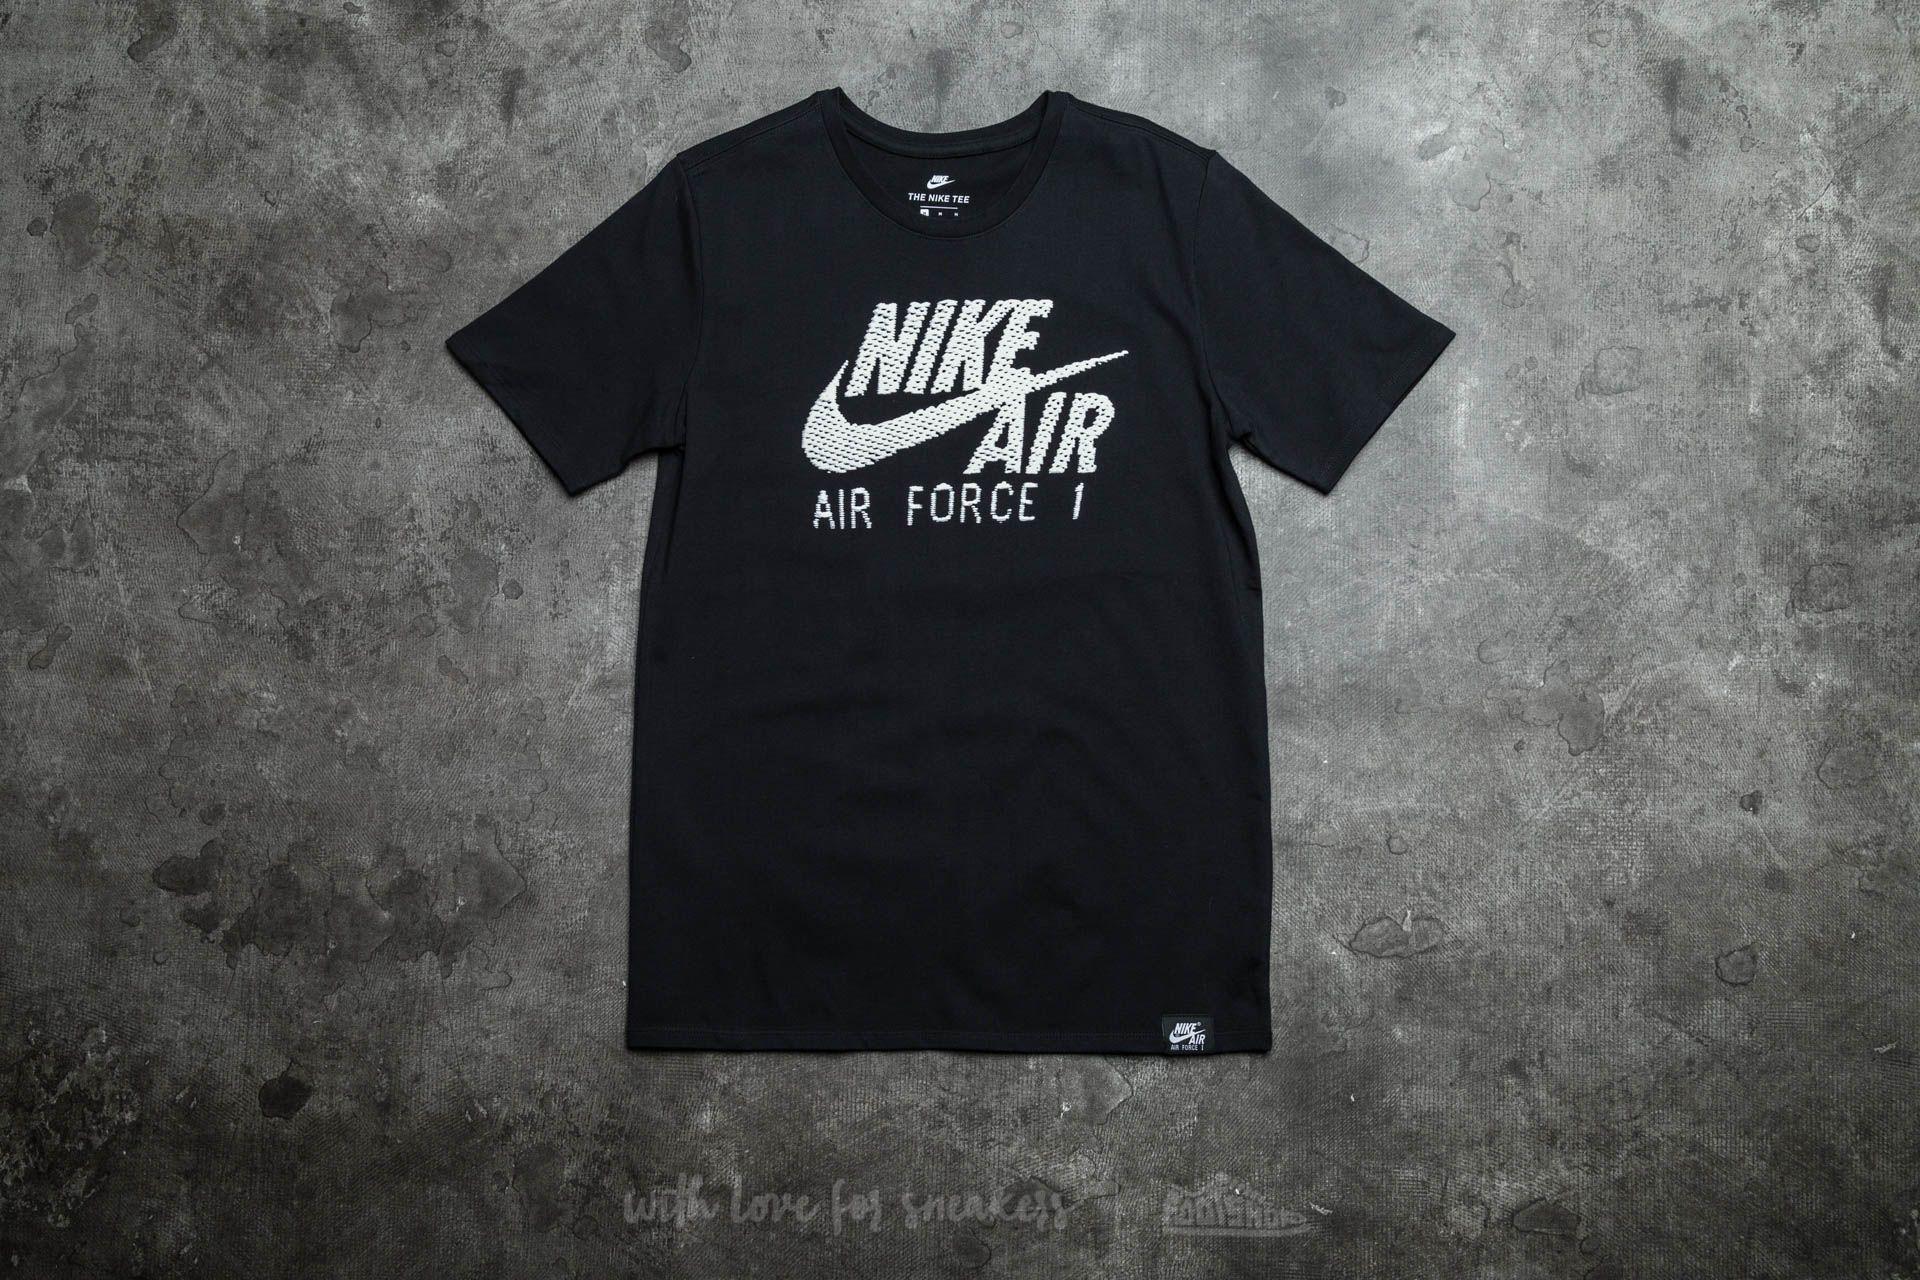 Nike Sportswear Air Force 1 Logo Tee Black/ White